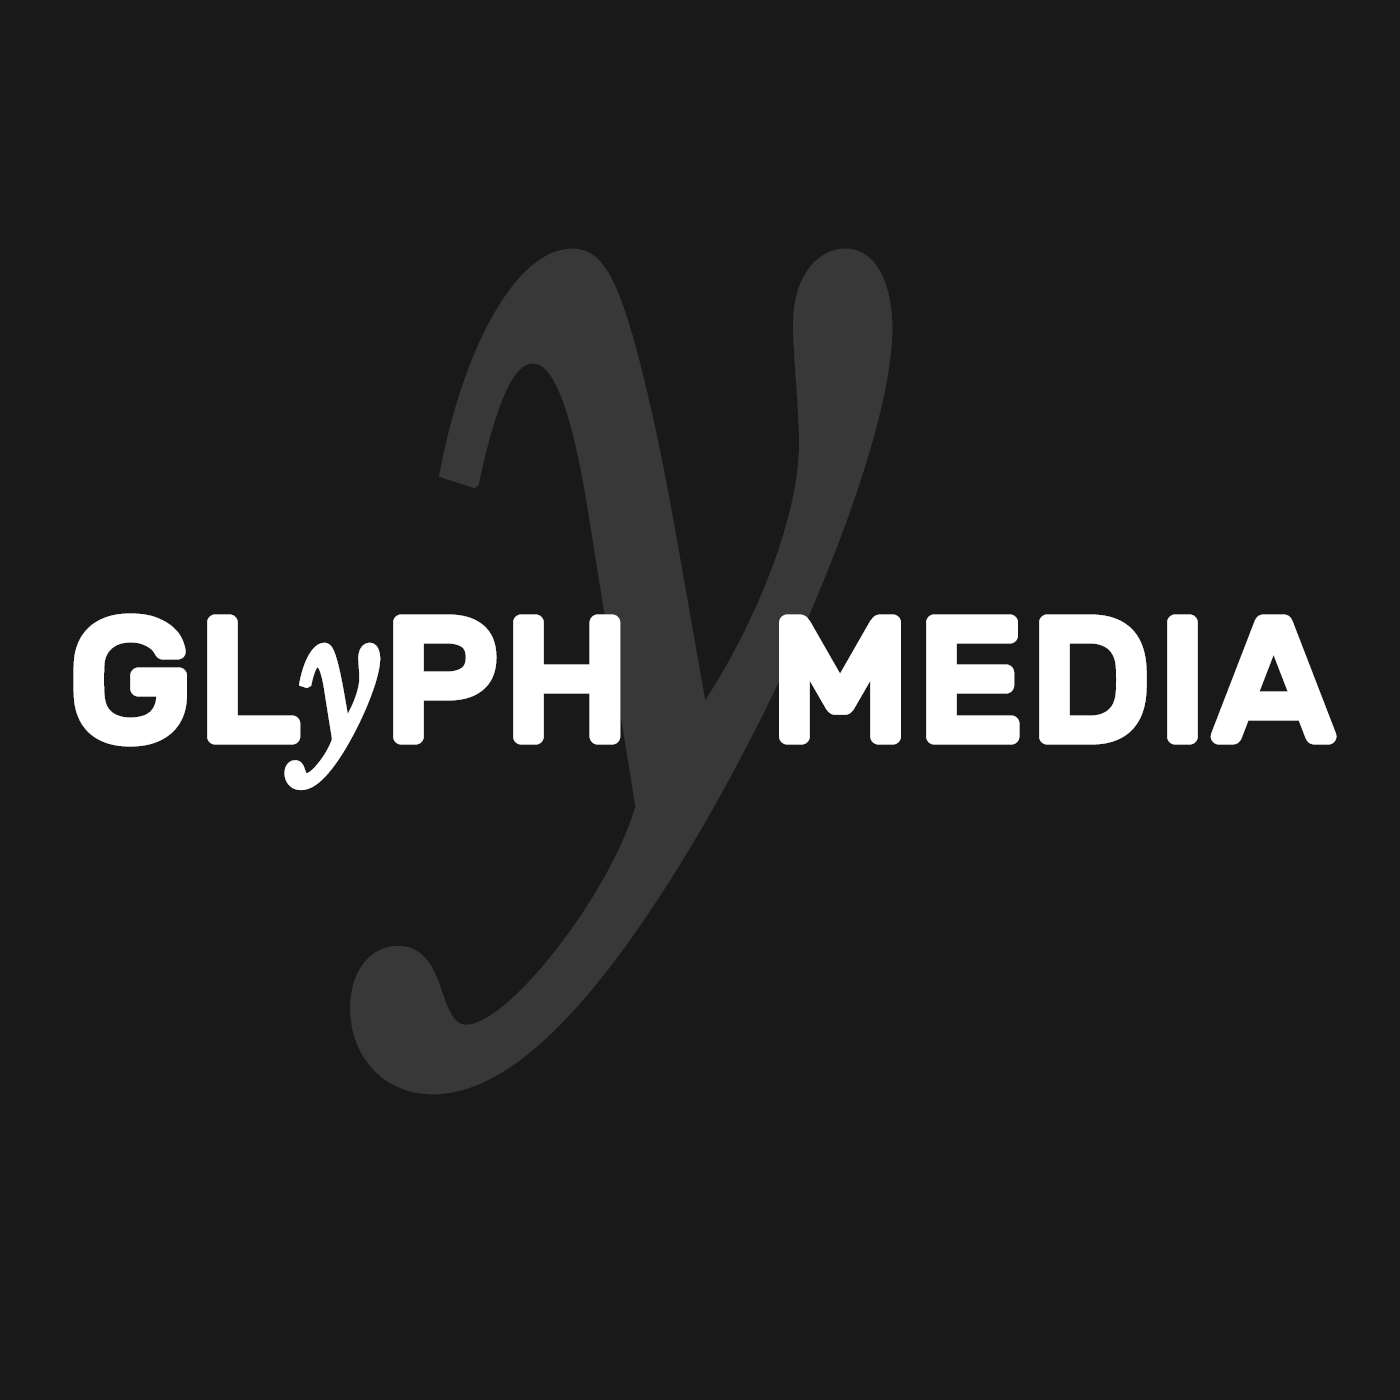 Glyph_logo_new1400.png